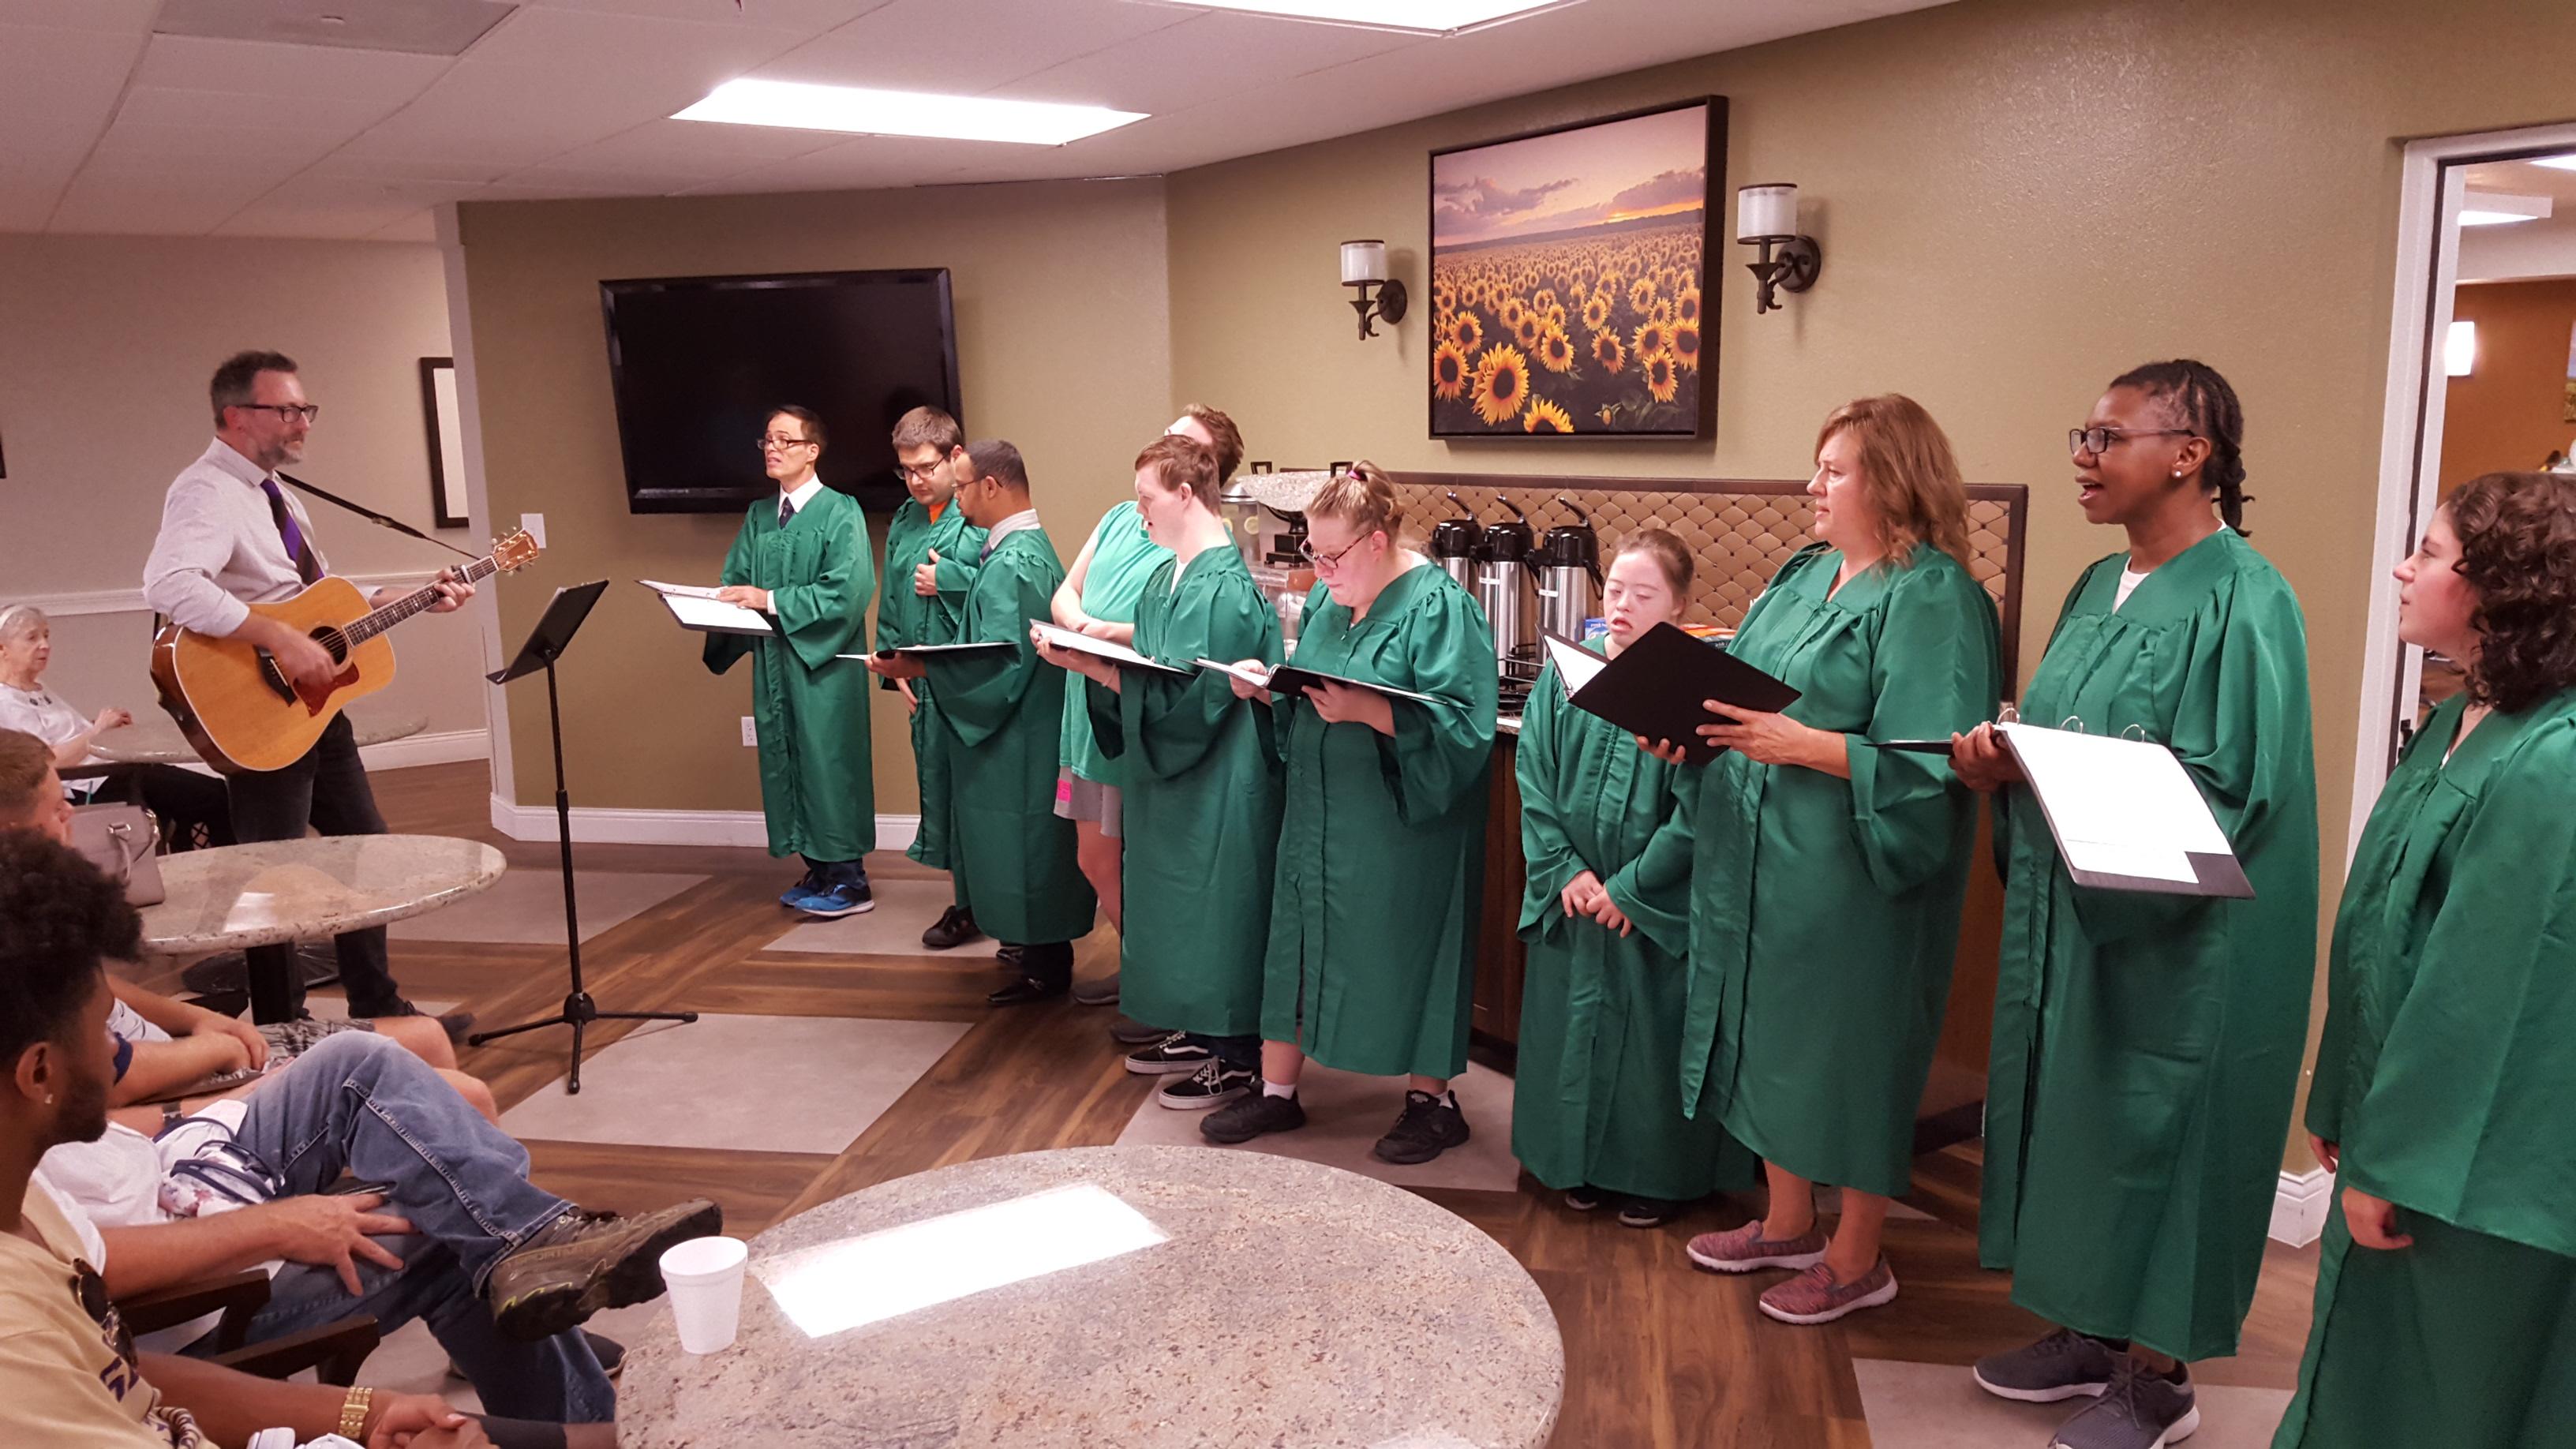 Civitones choir perform for audience